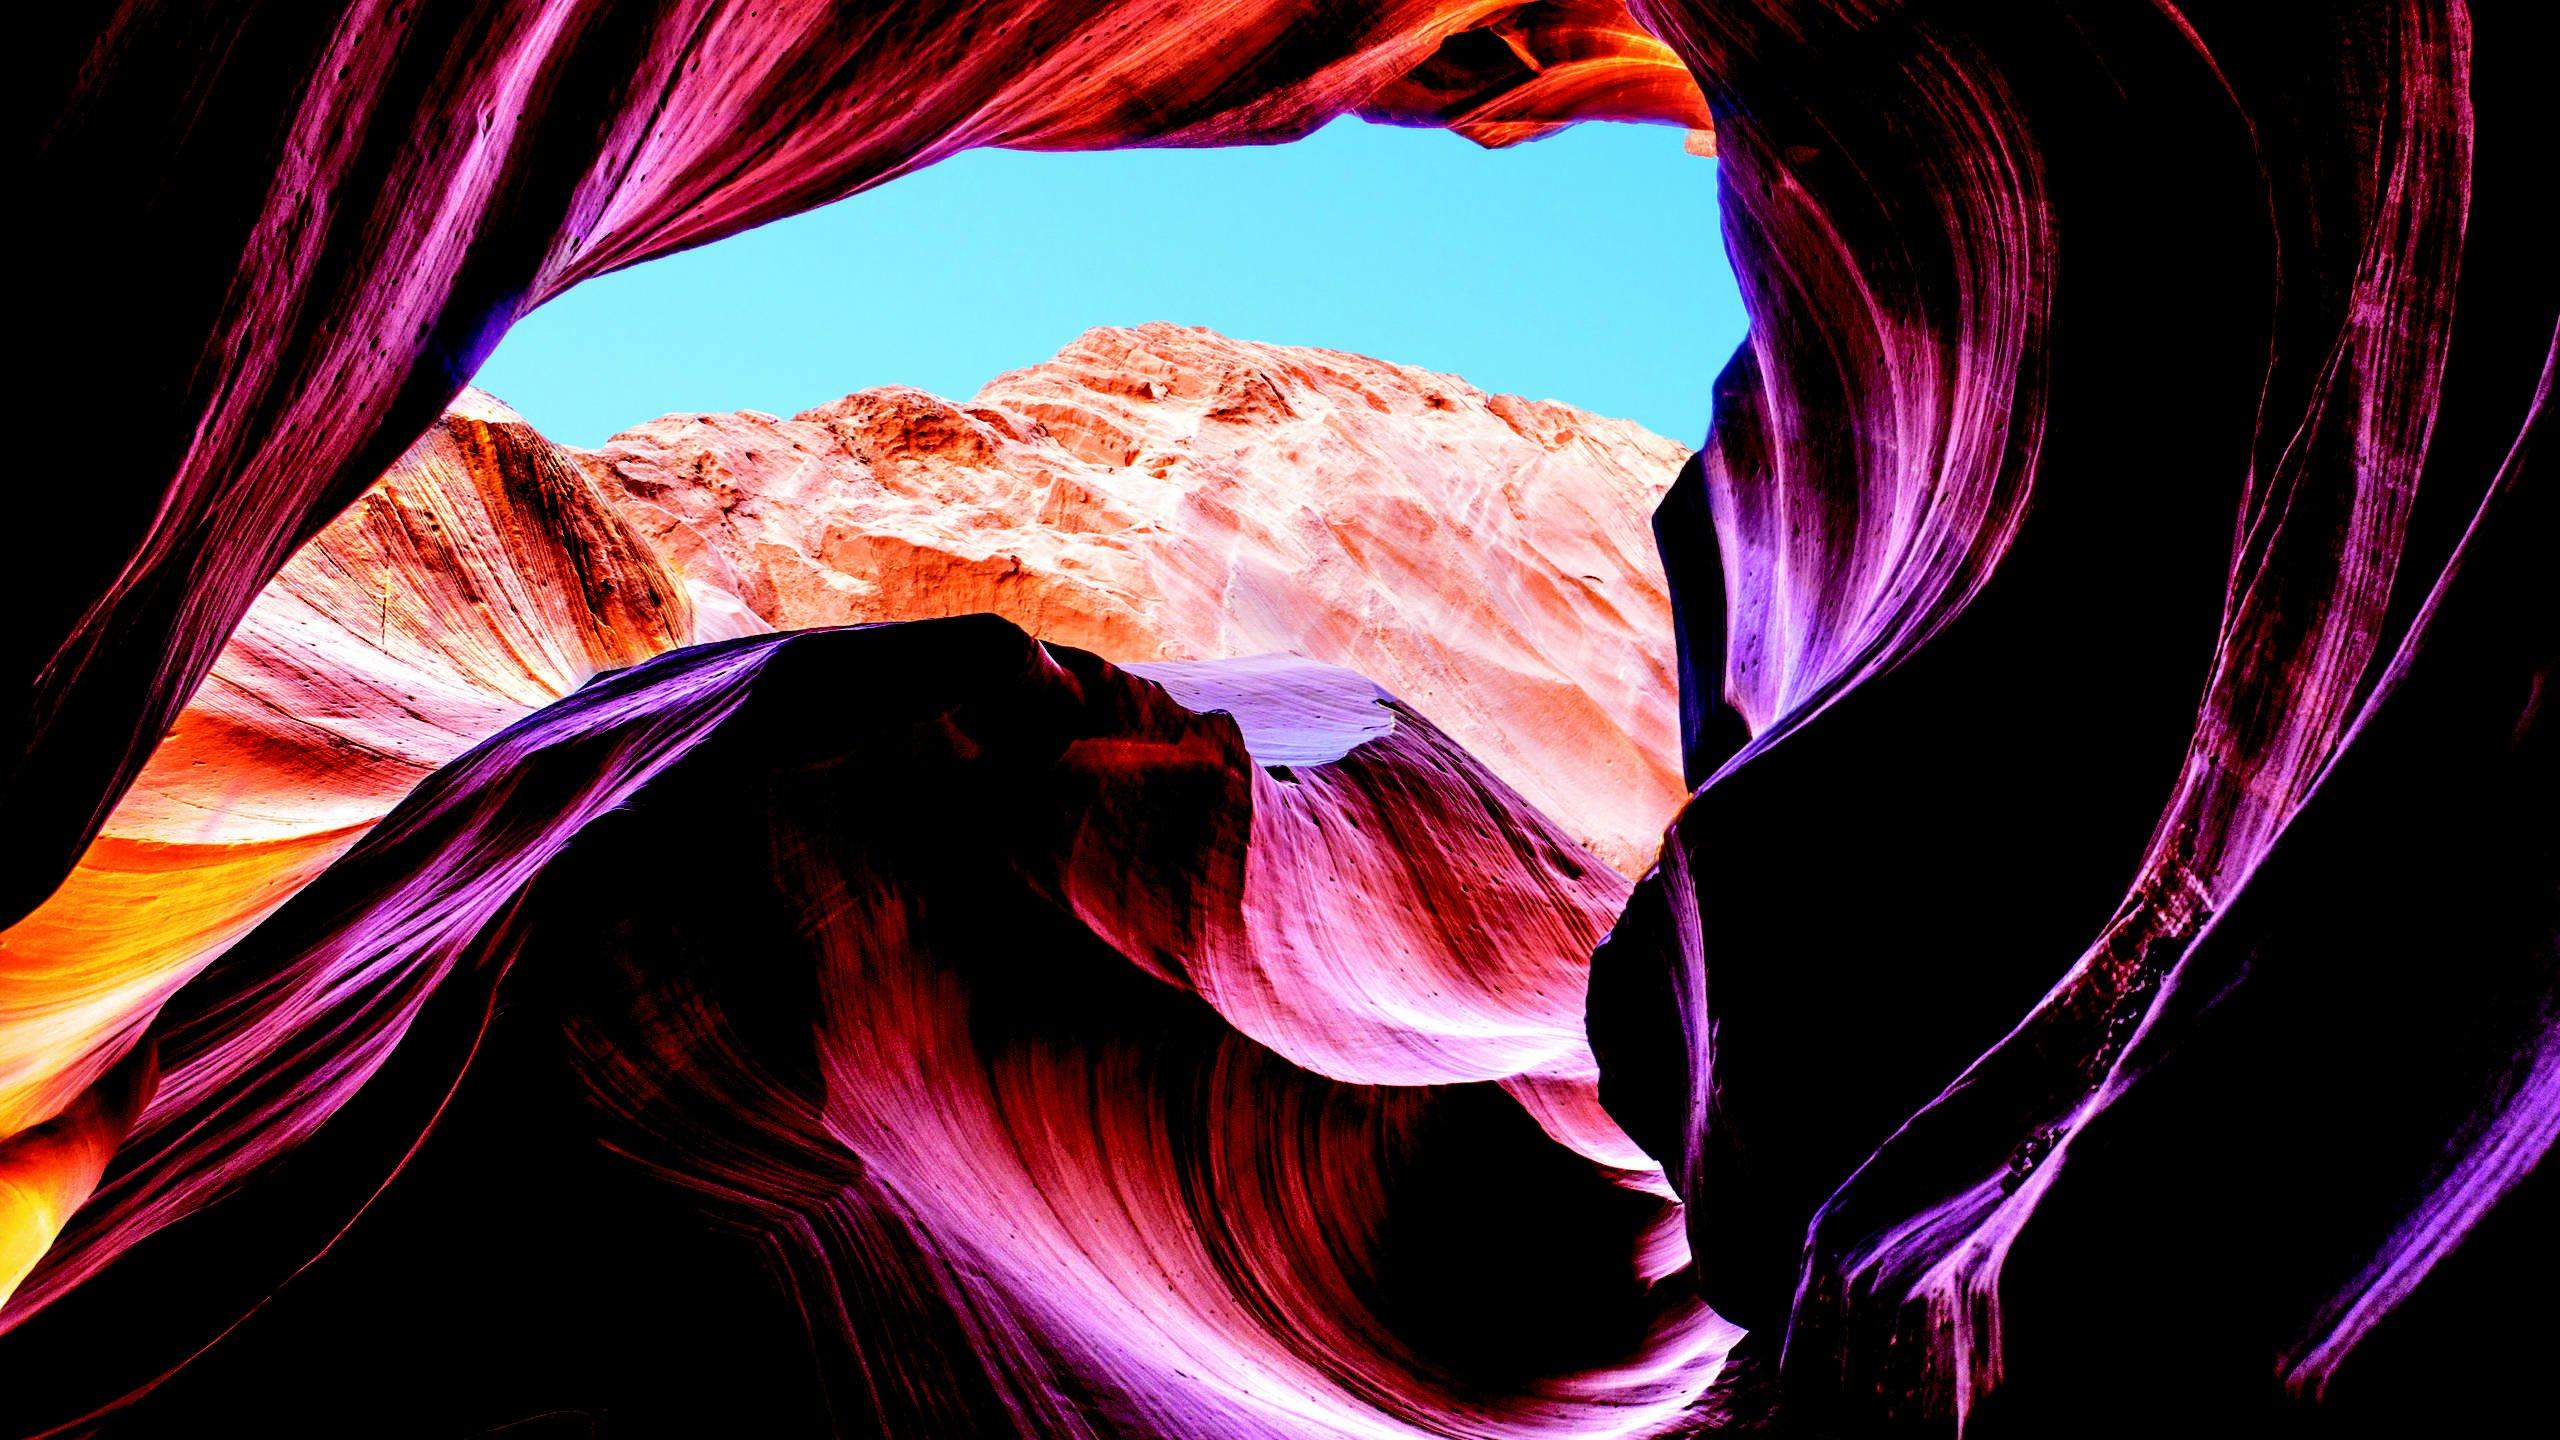 Slot canyon wallpaper